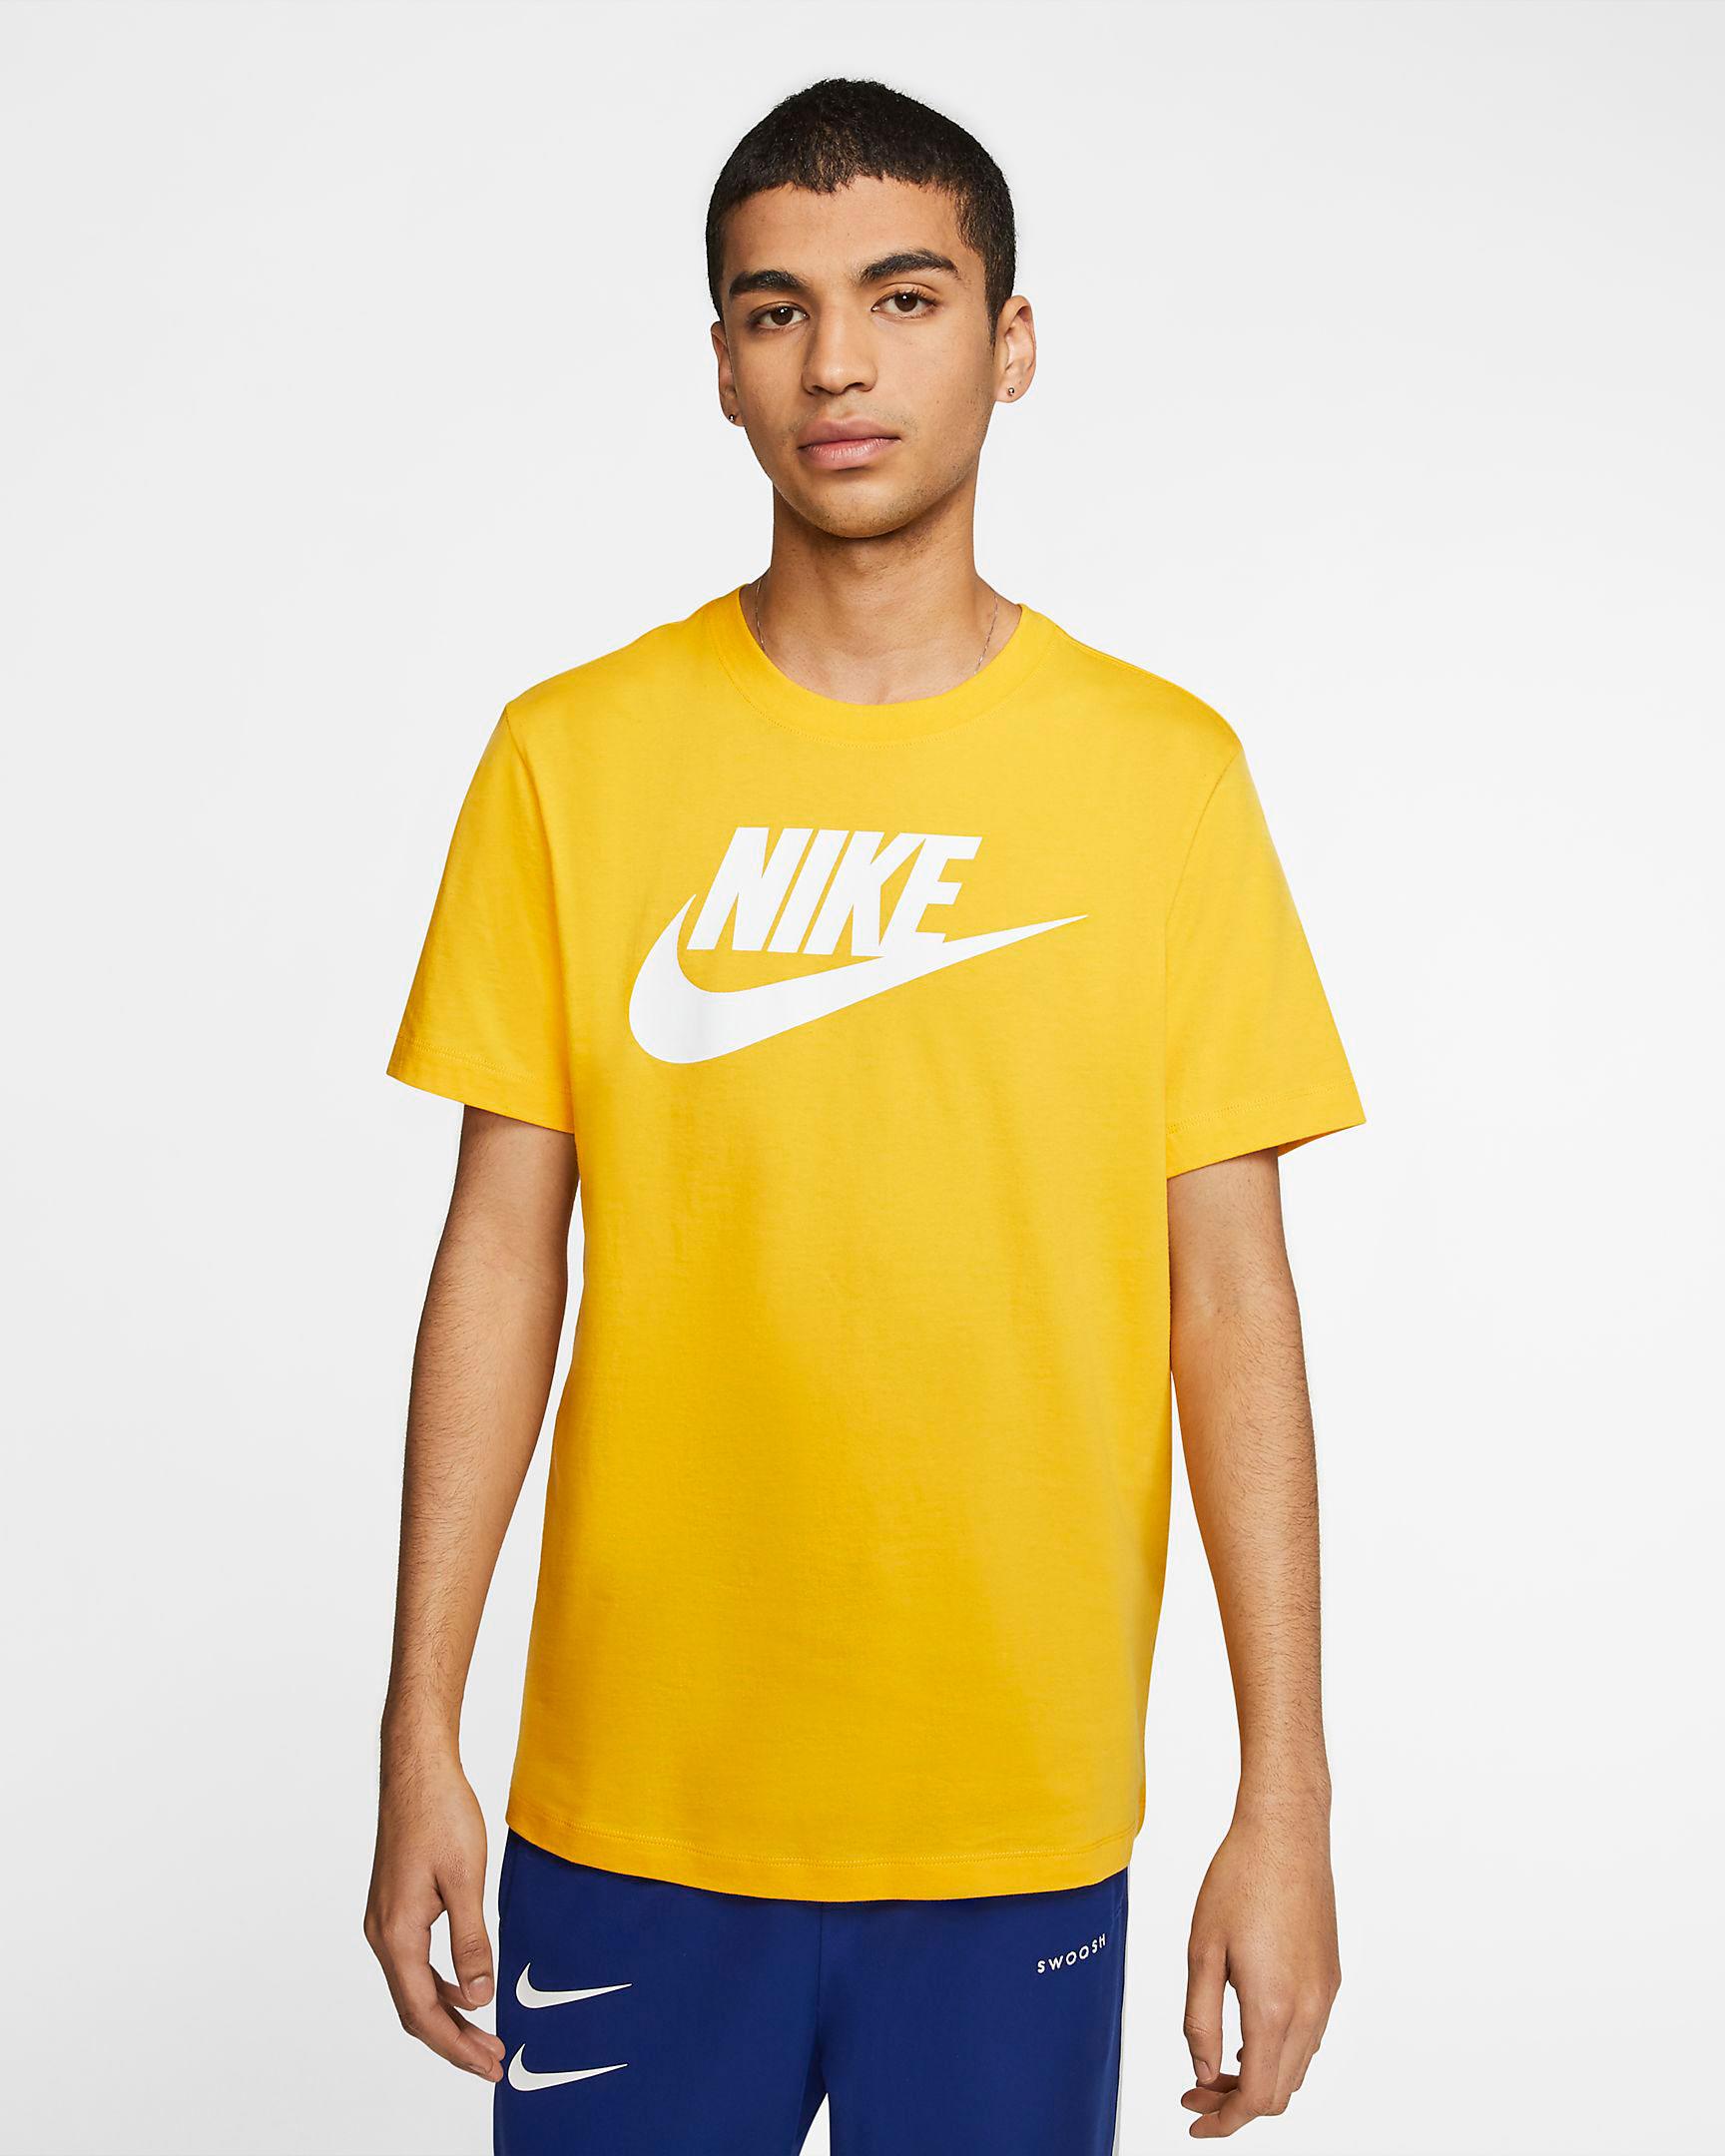 nike-dunk-low-brazil-t-shirt-match